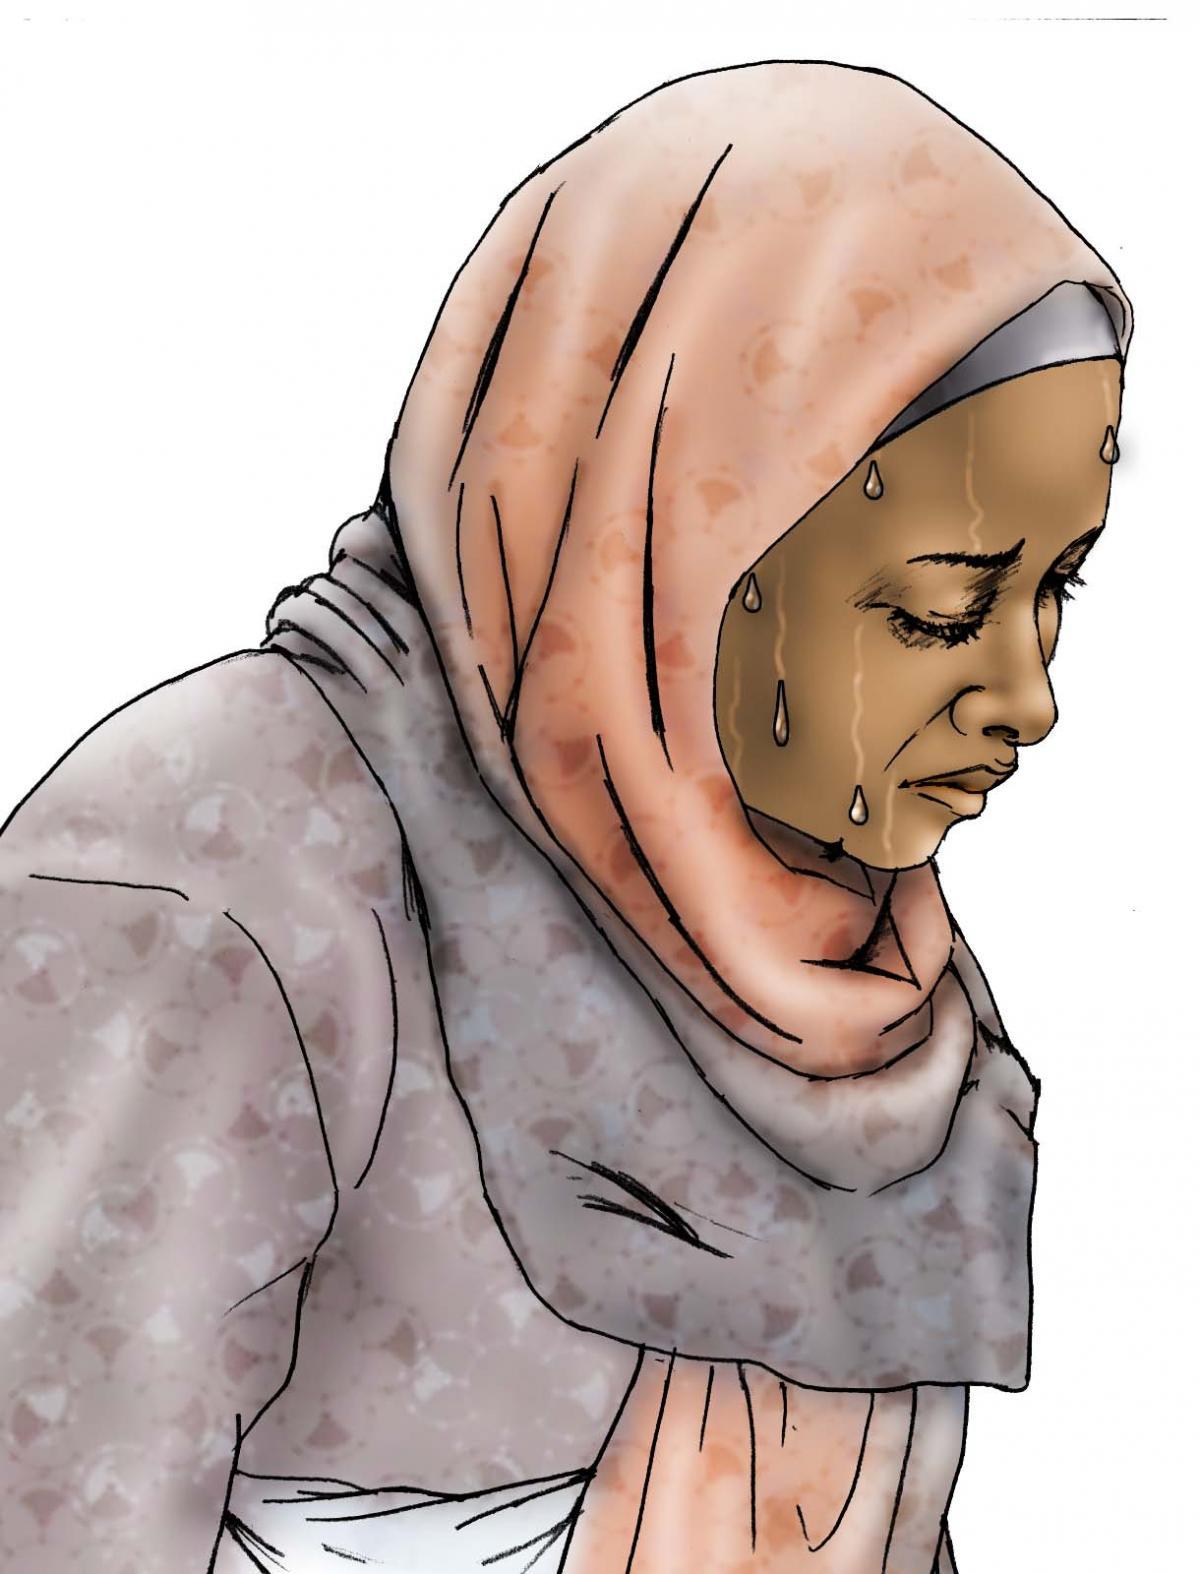 Maternal health - When to visit the health clinic - pregnancy - 11 - Kenya Dadaab